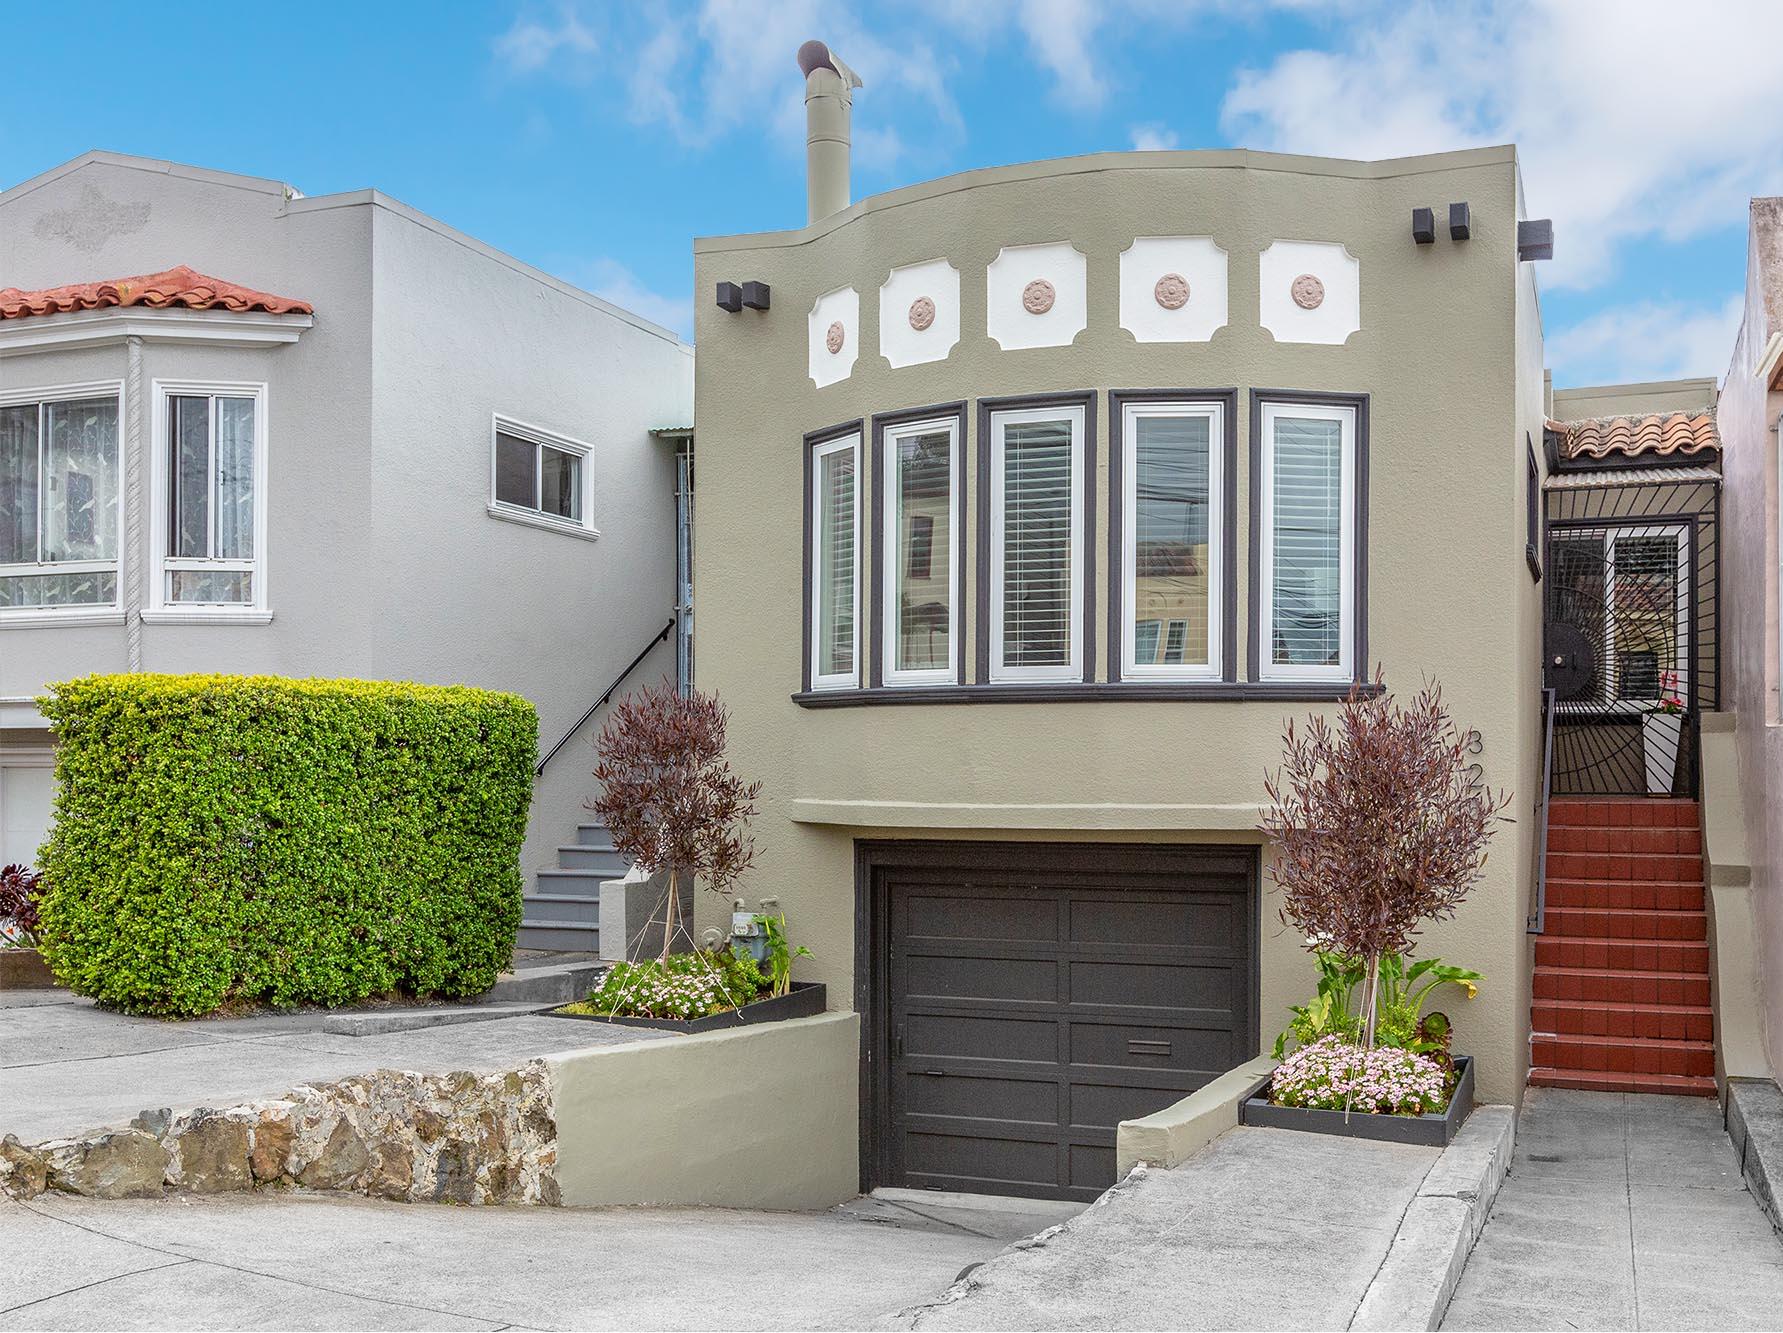 Home for Sale in San Francisco at 323 Byxbee Street Presented by Alek Keytiyev Realtor